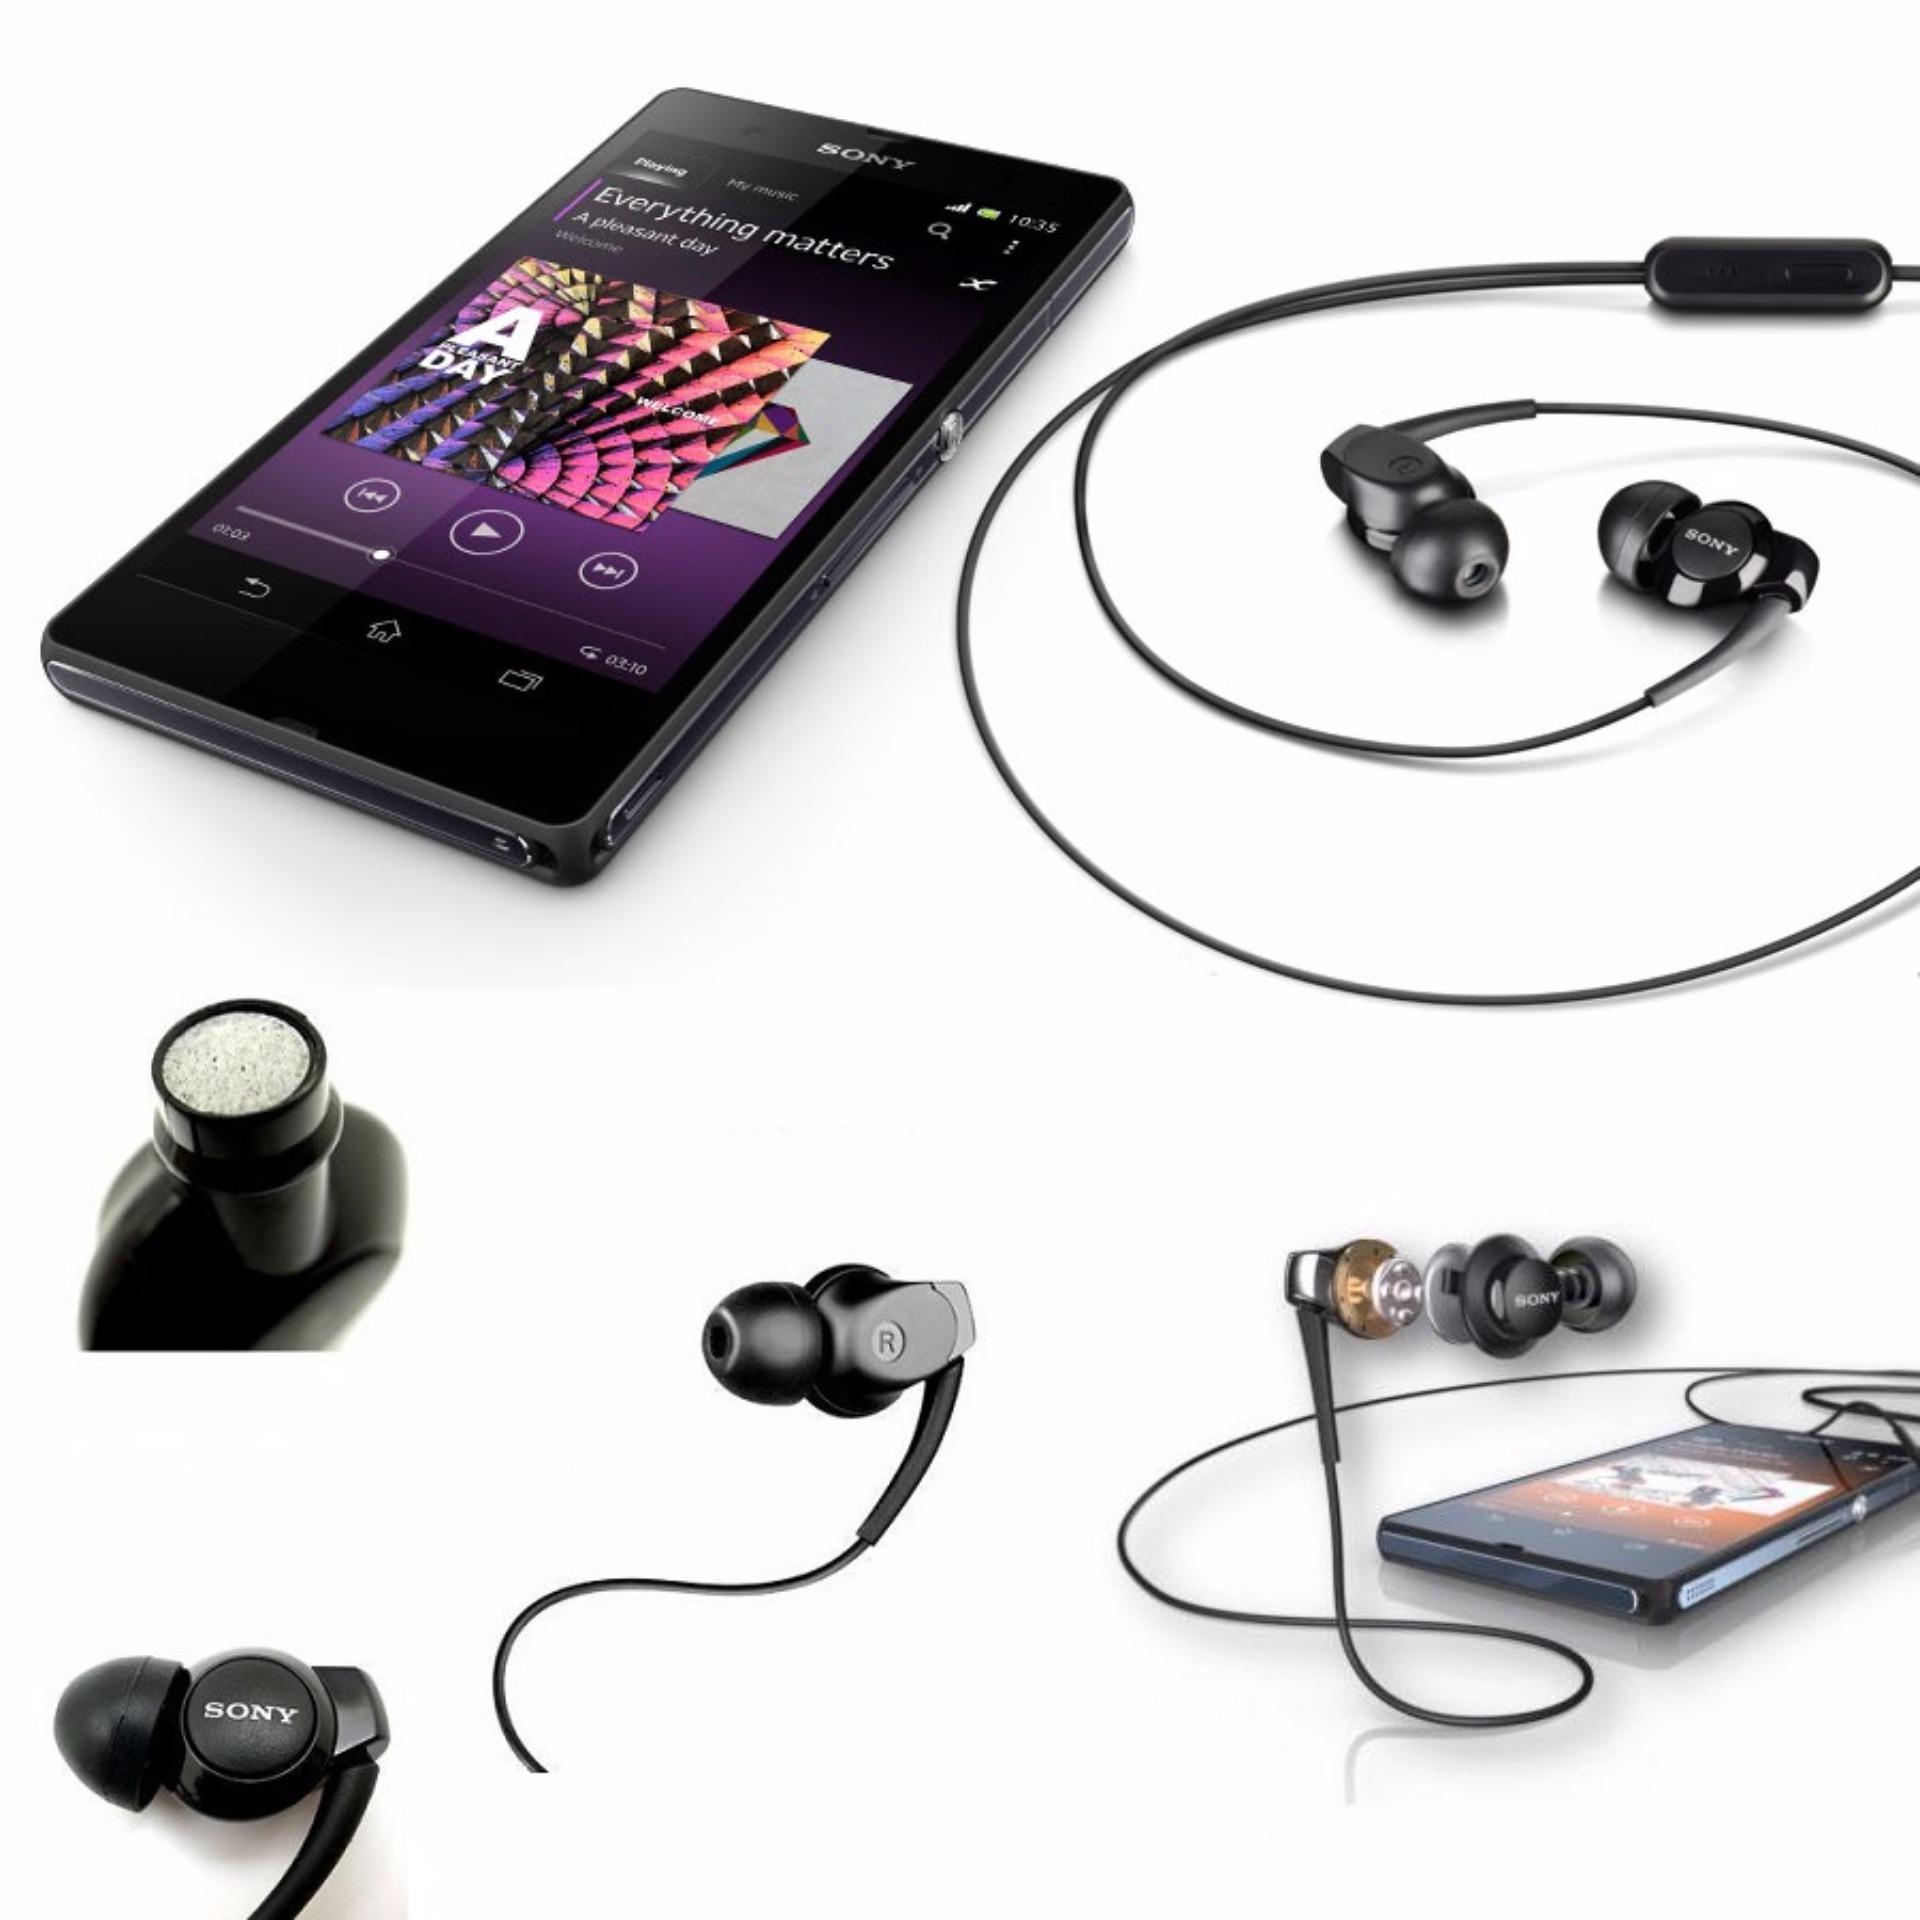 Diskon Sony Wireless In Ear Headphones Wi C400 Merah Lihat Hansfree Xperia Series Pause Stereo Handsfree Headphone For Mh Ex300ap